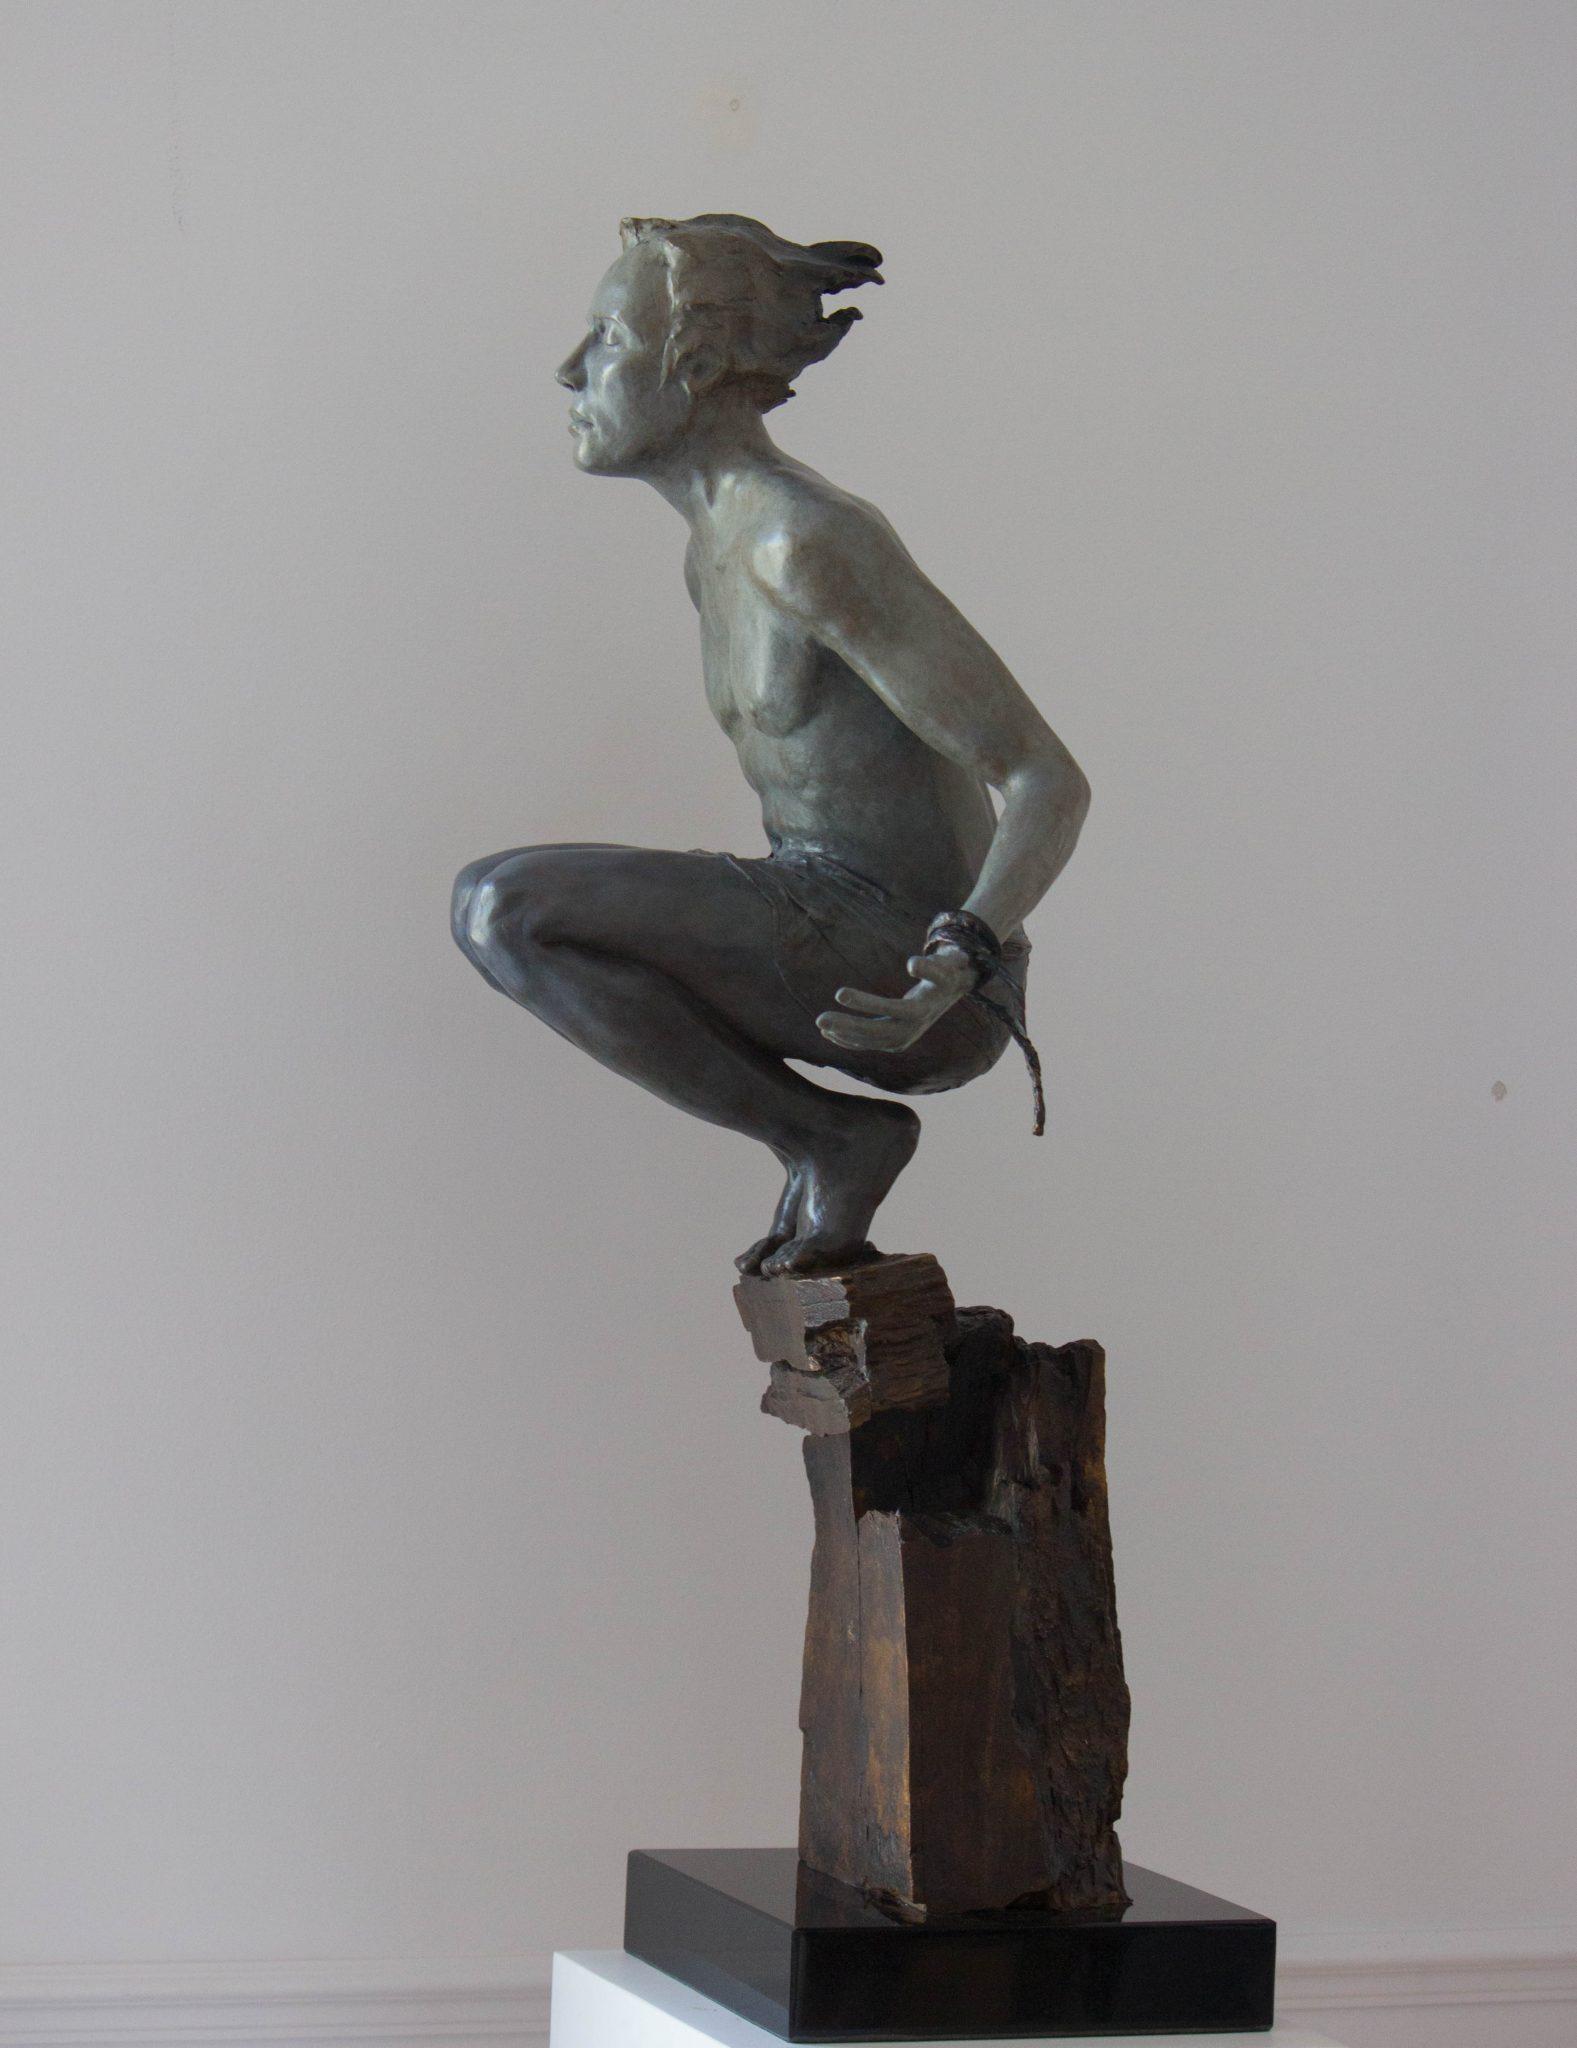 Andre Desjardins artiste sculpteur